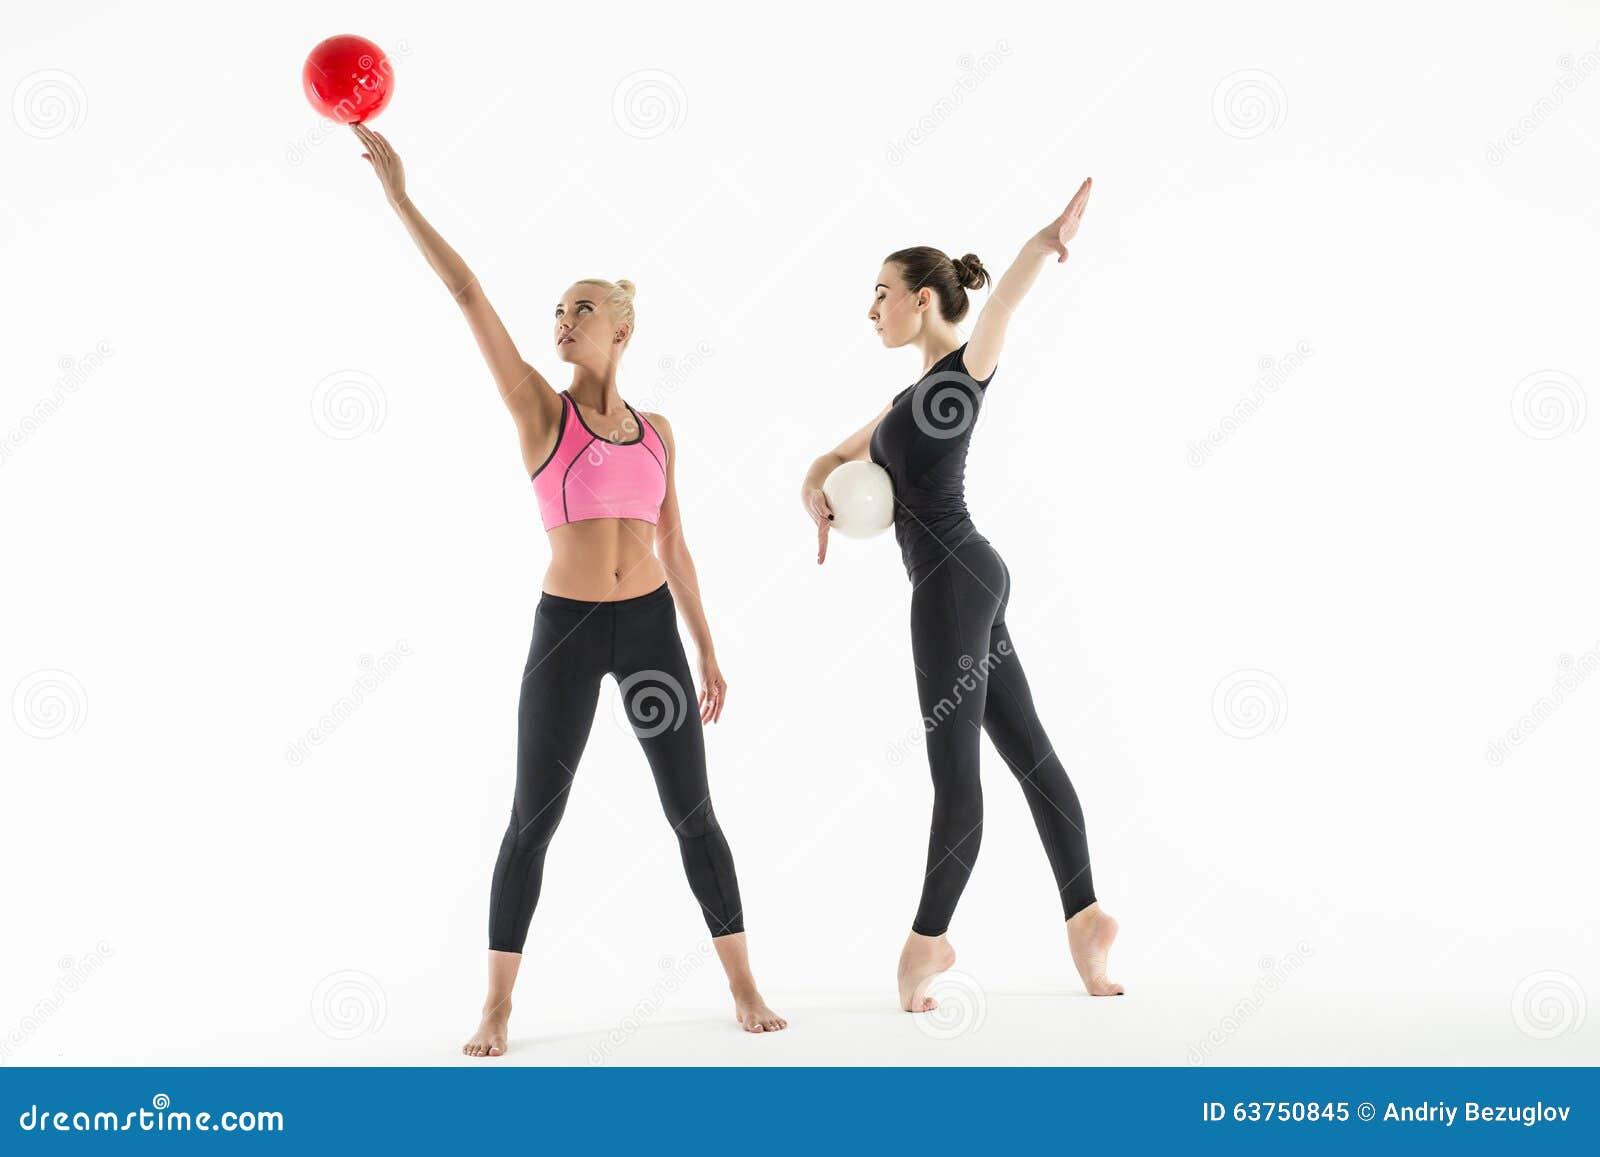 flexible sport girl photo